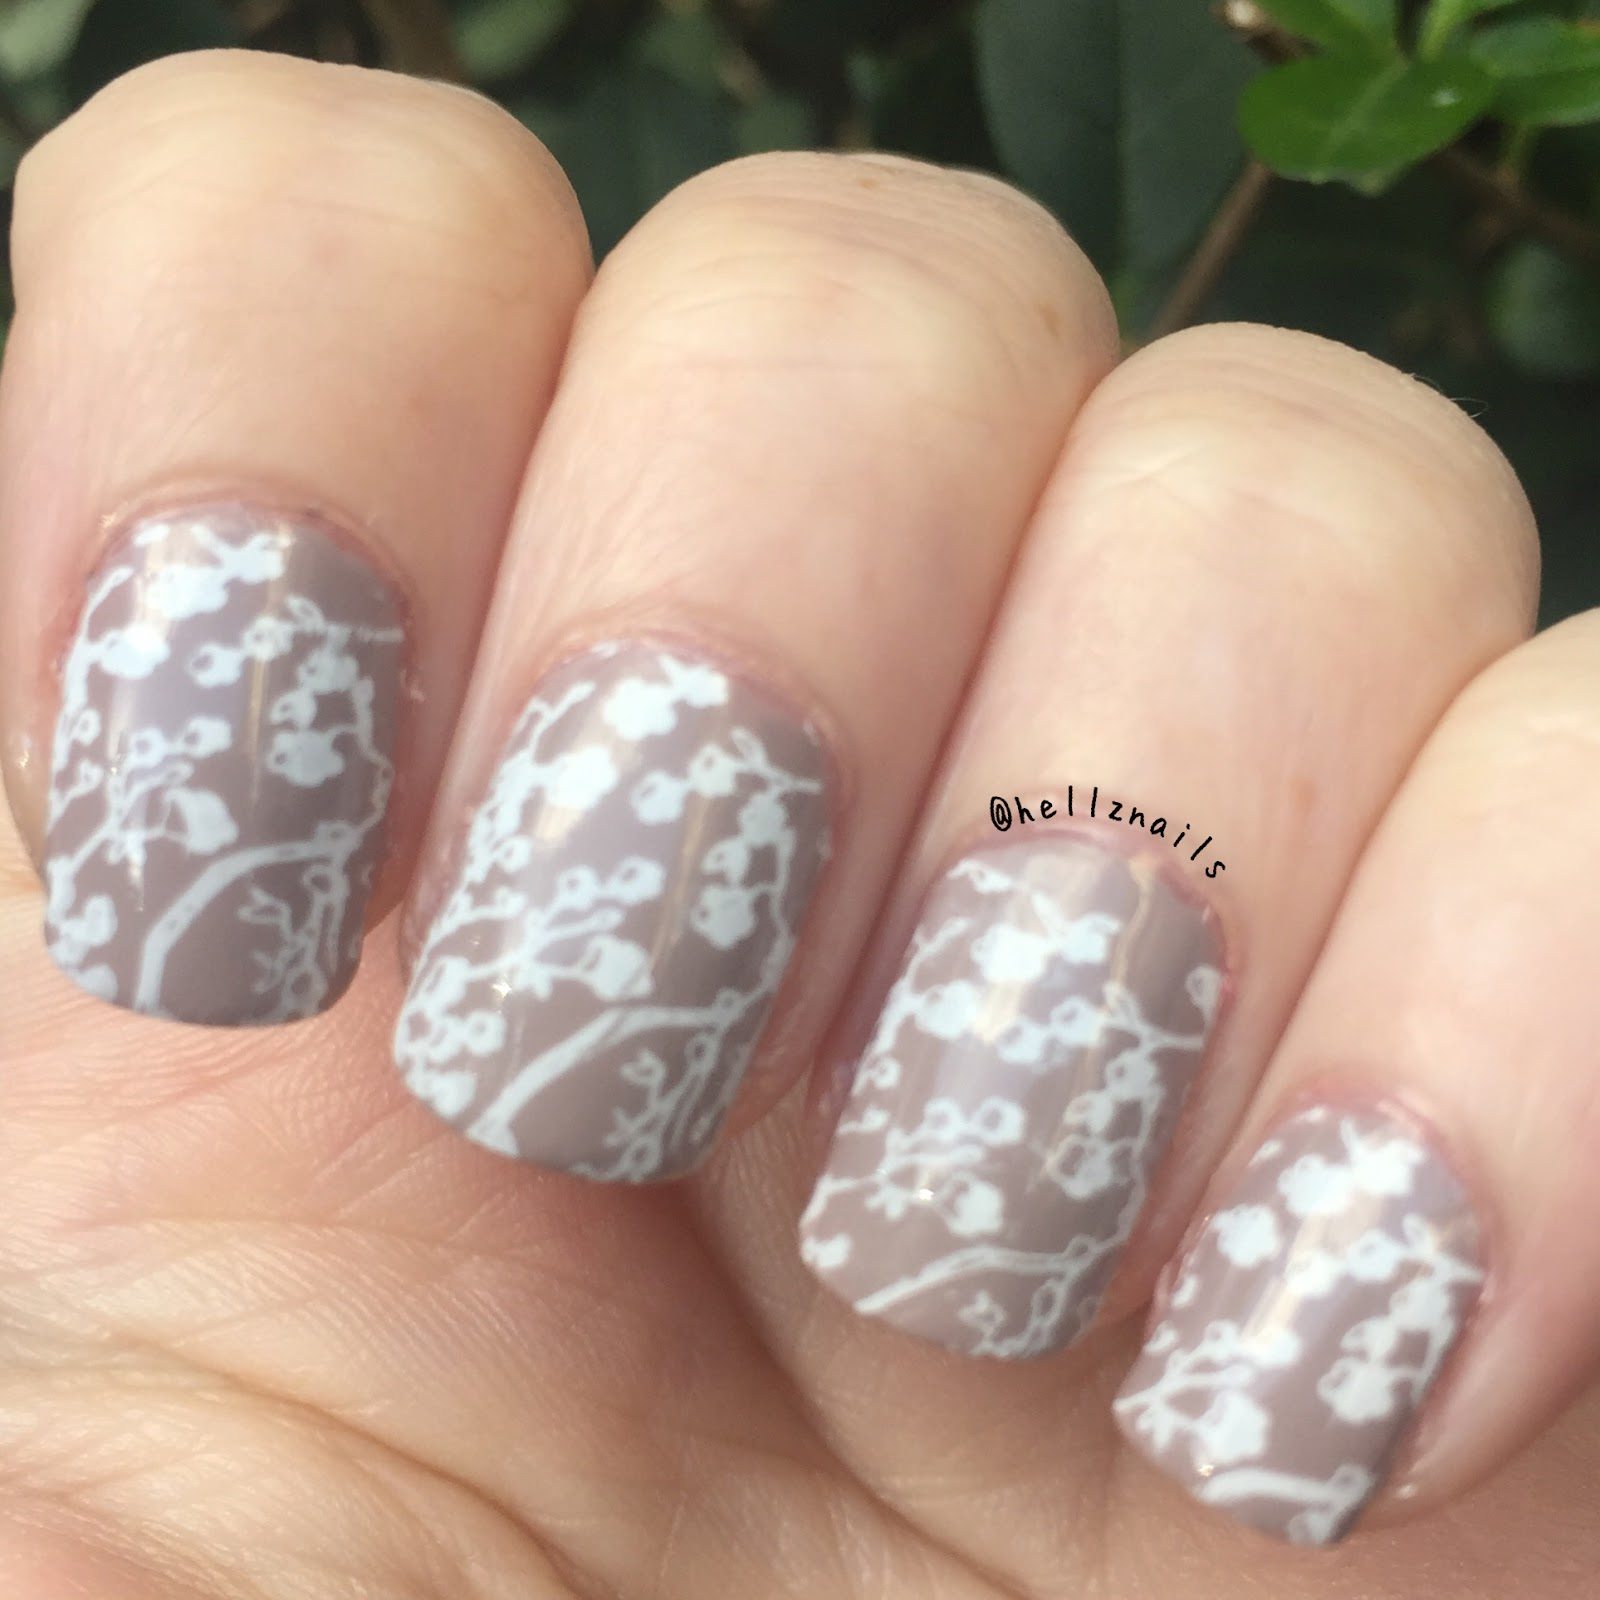 Delicate print nail art : 31 day nail challenge day 15 - Hellz nails